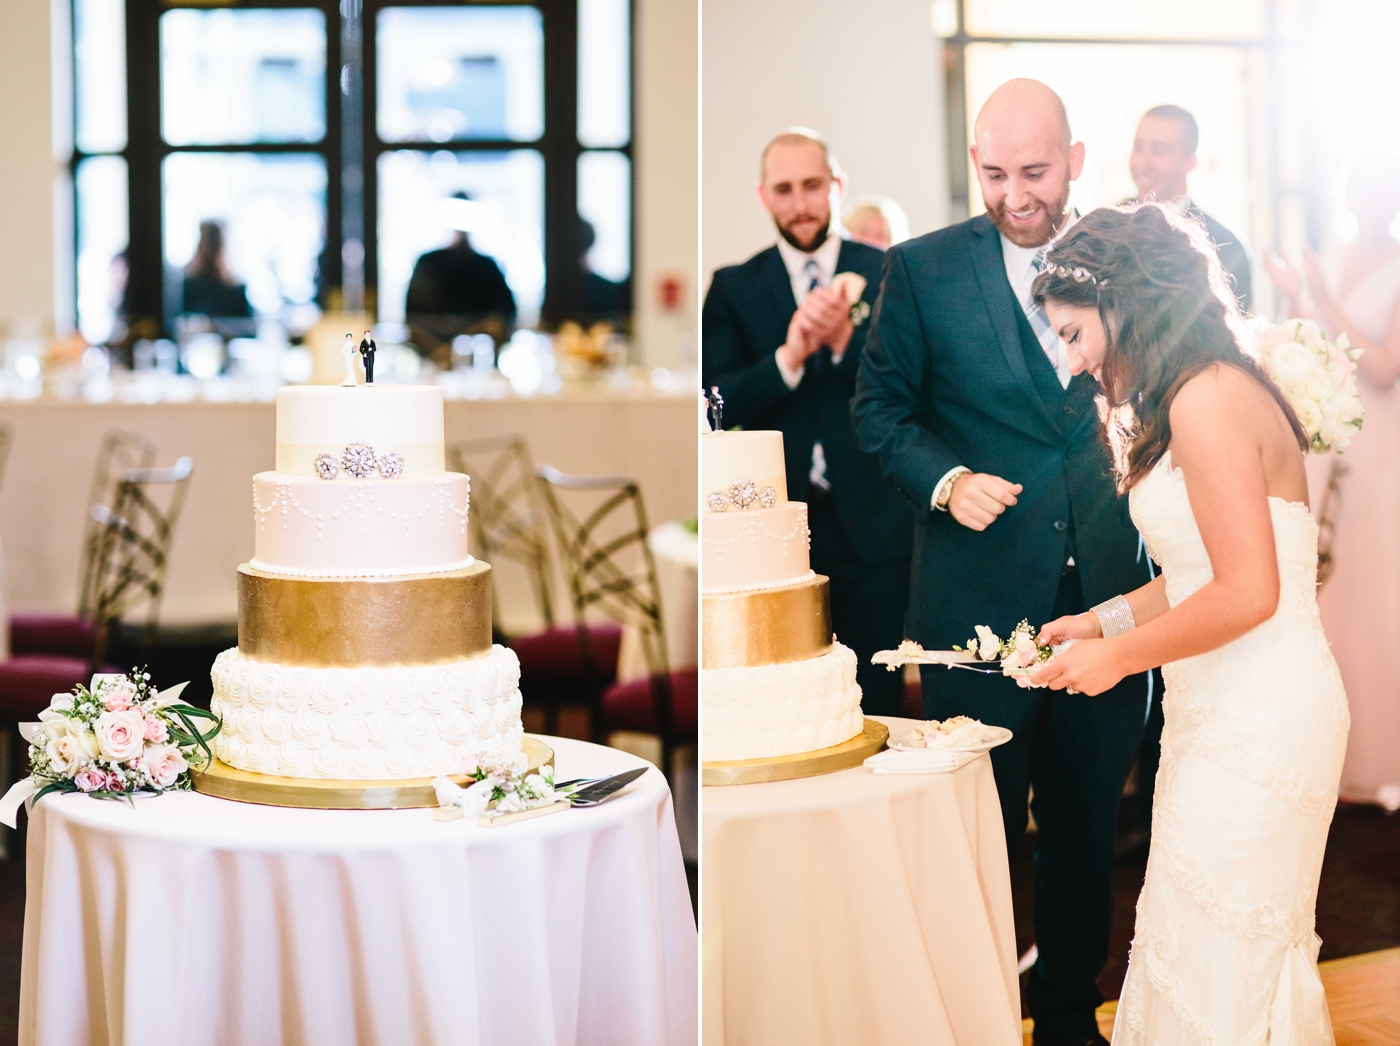 chicago-fine-art-wedding-photography-svihra20